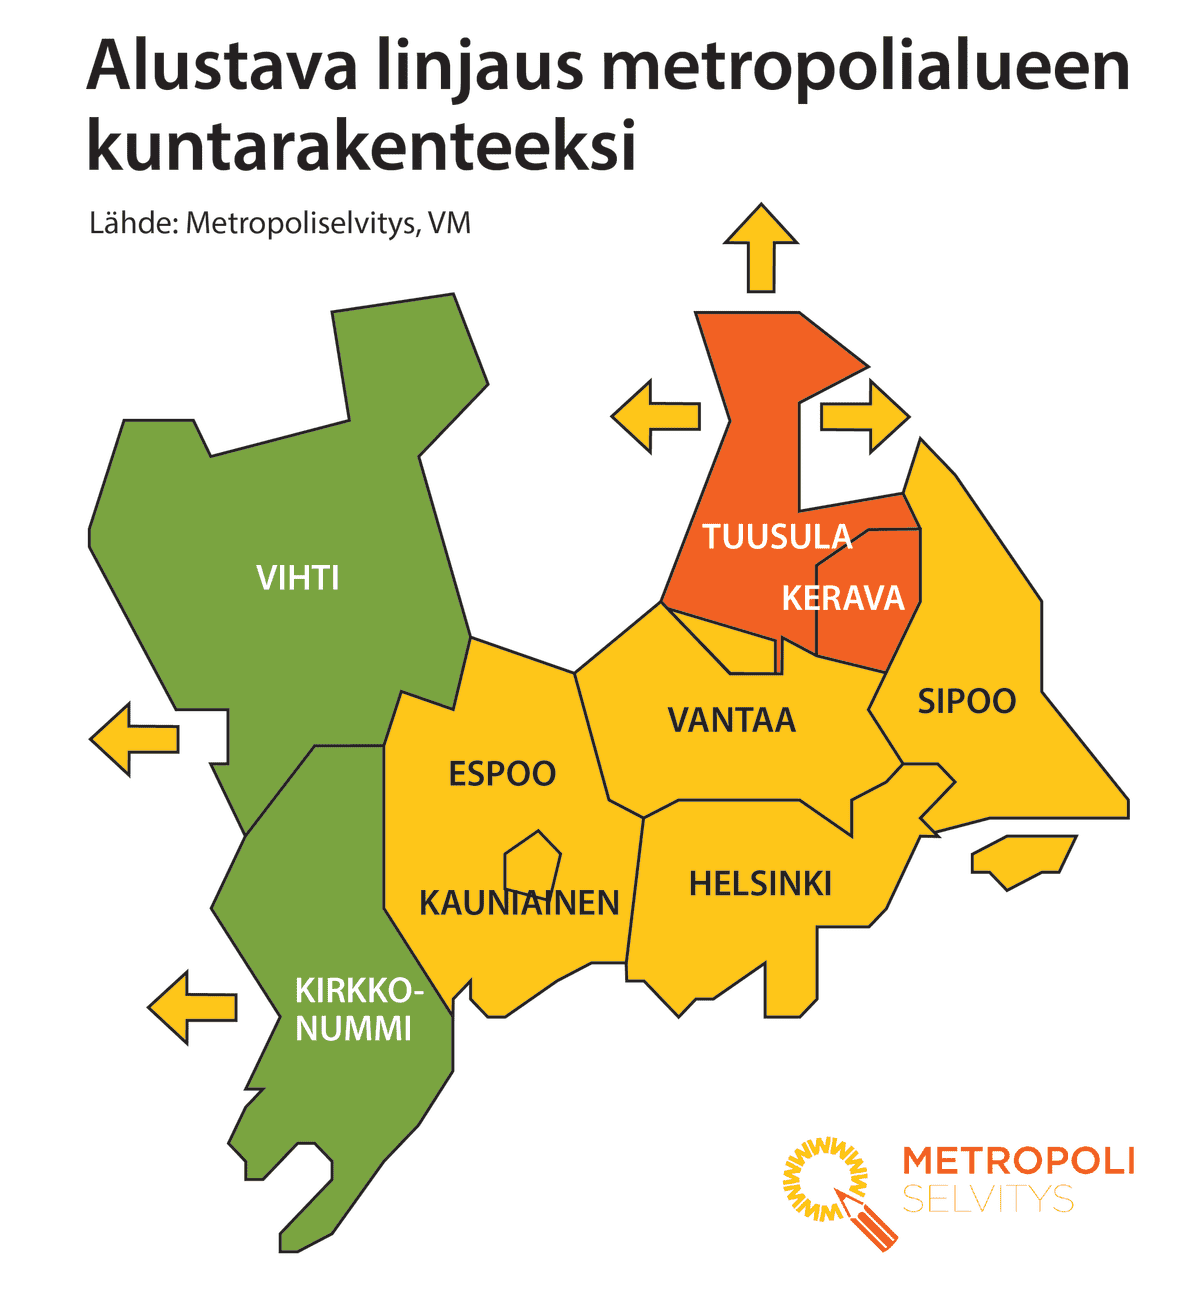 Metropoliselvityksen alue